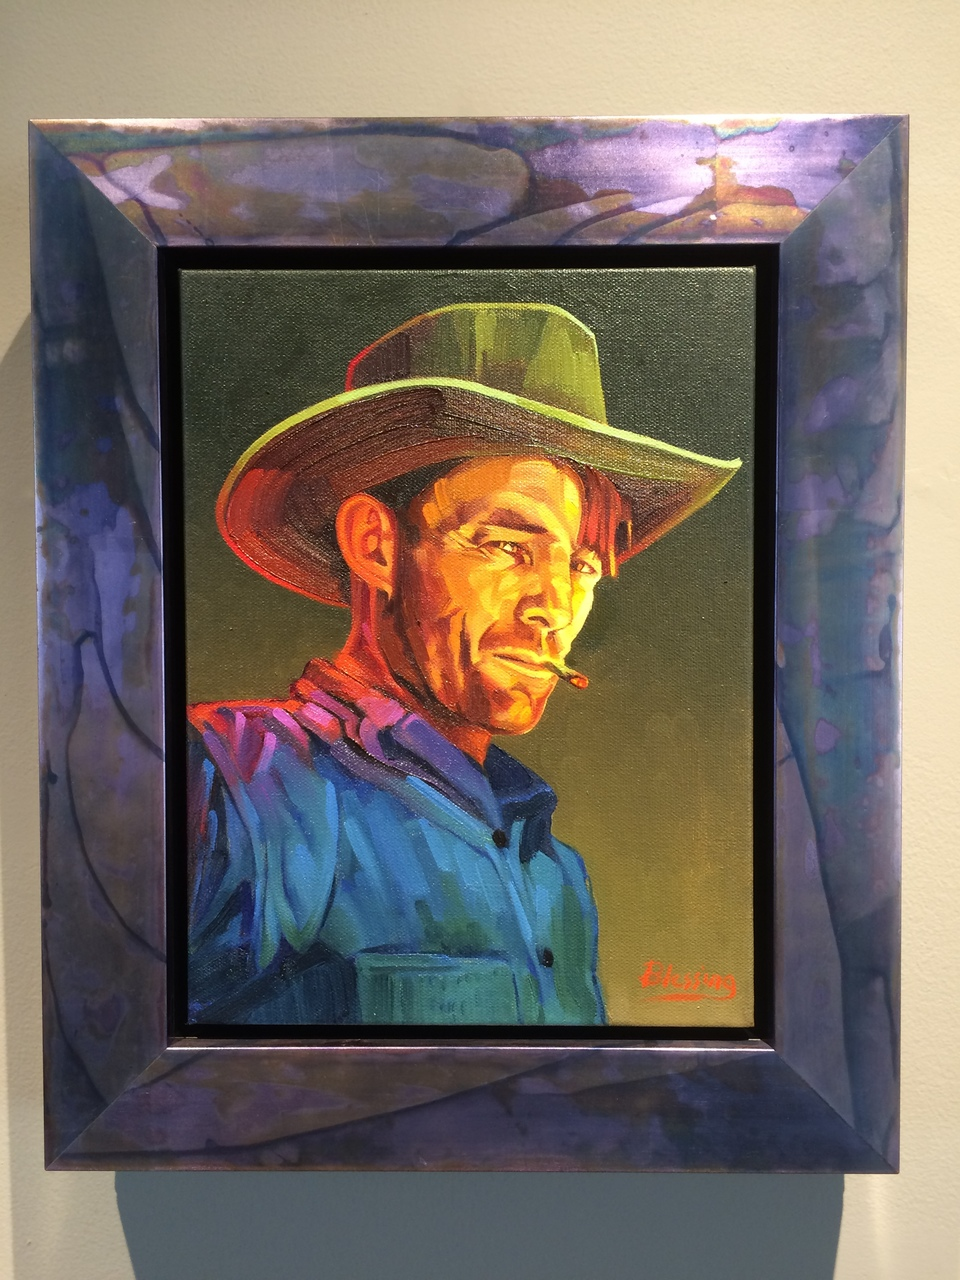 Tom Houk - The Frame Maker